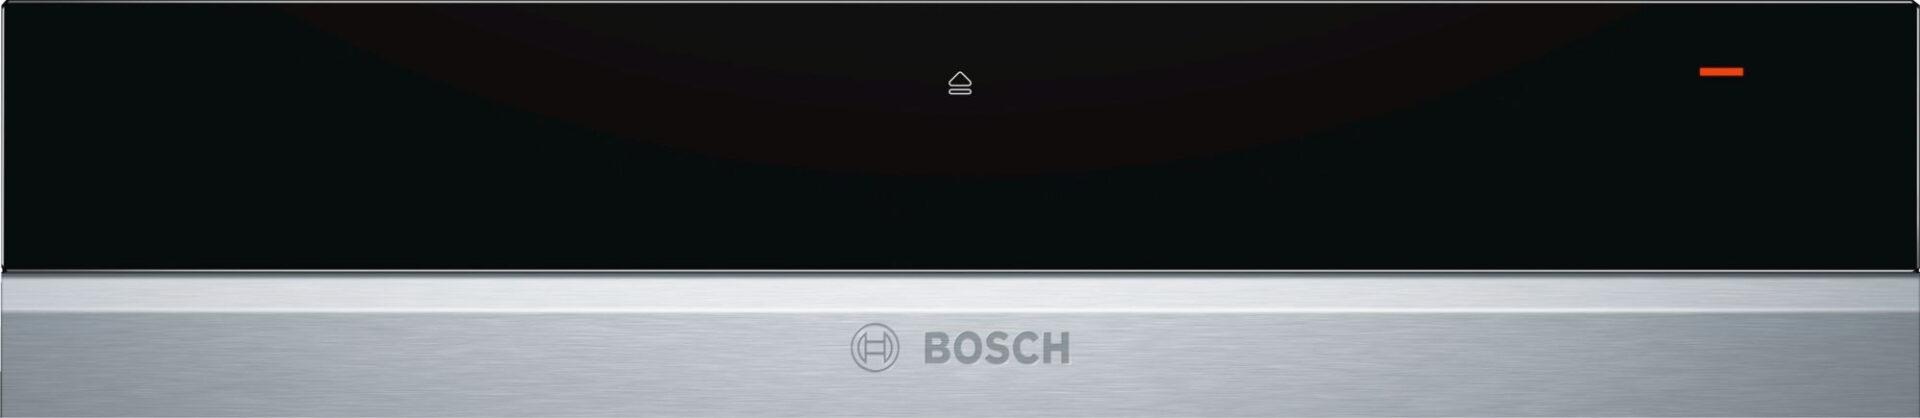 BOSCH BIC630NS1 UGRADNA PLOCA